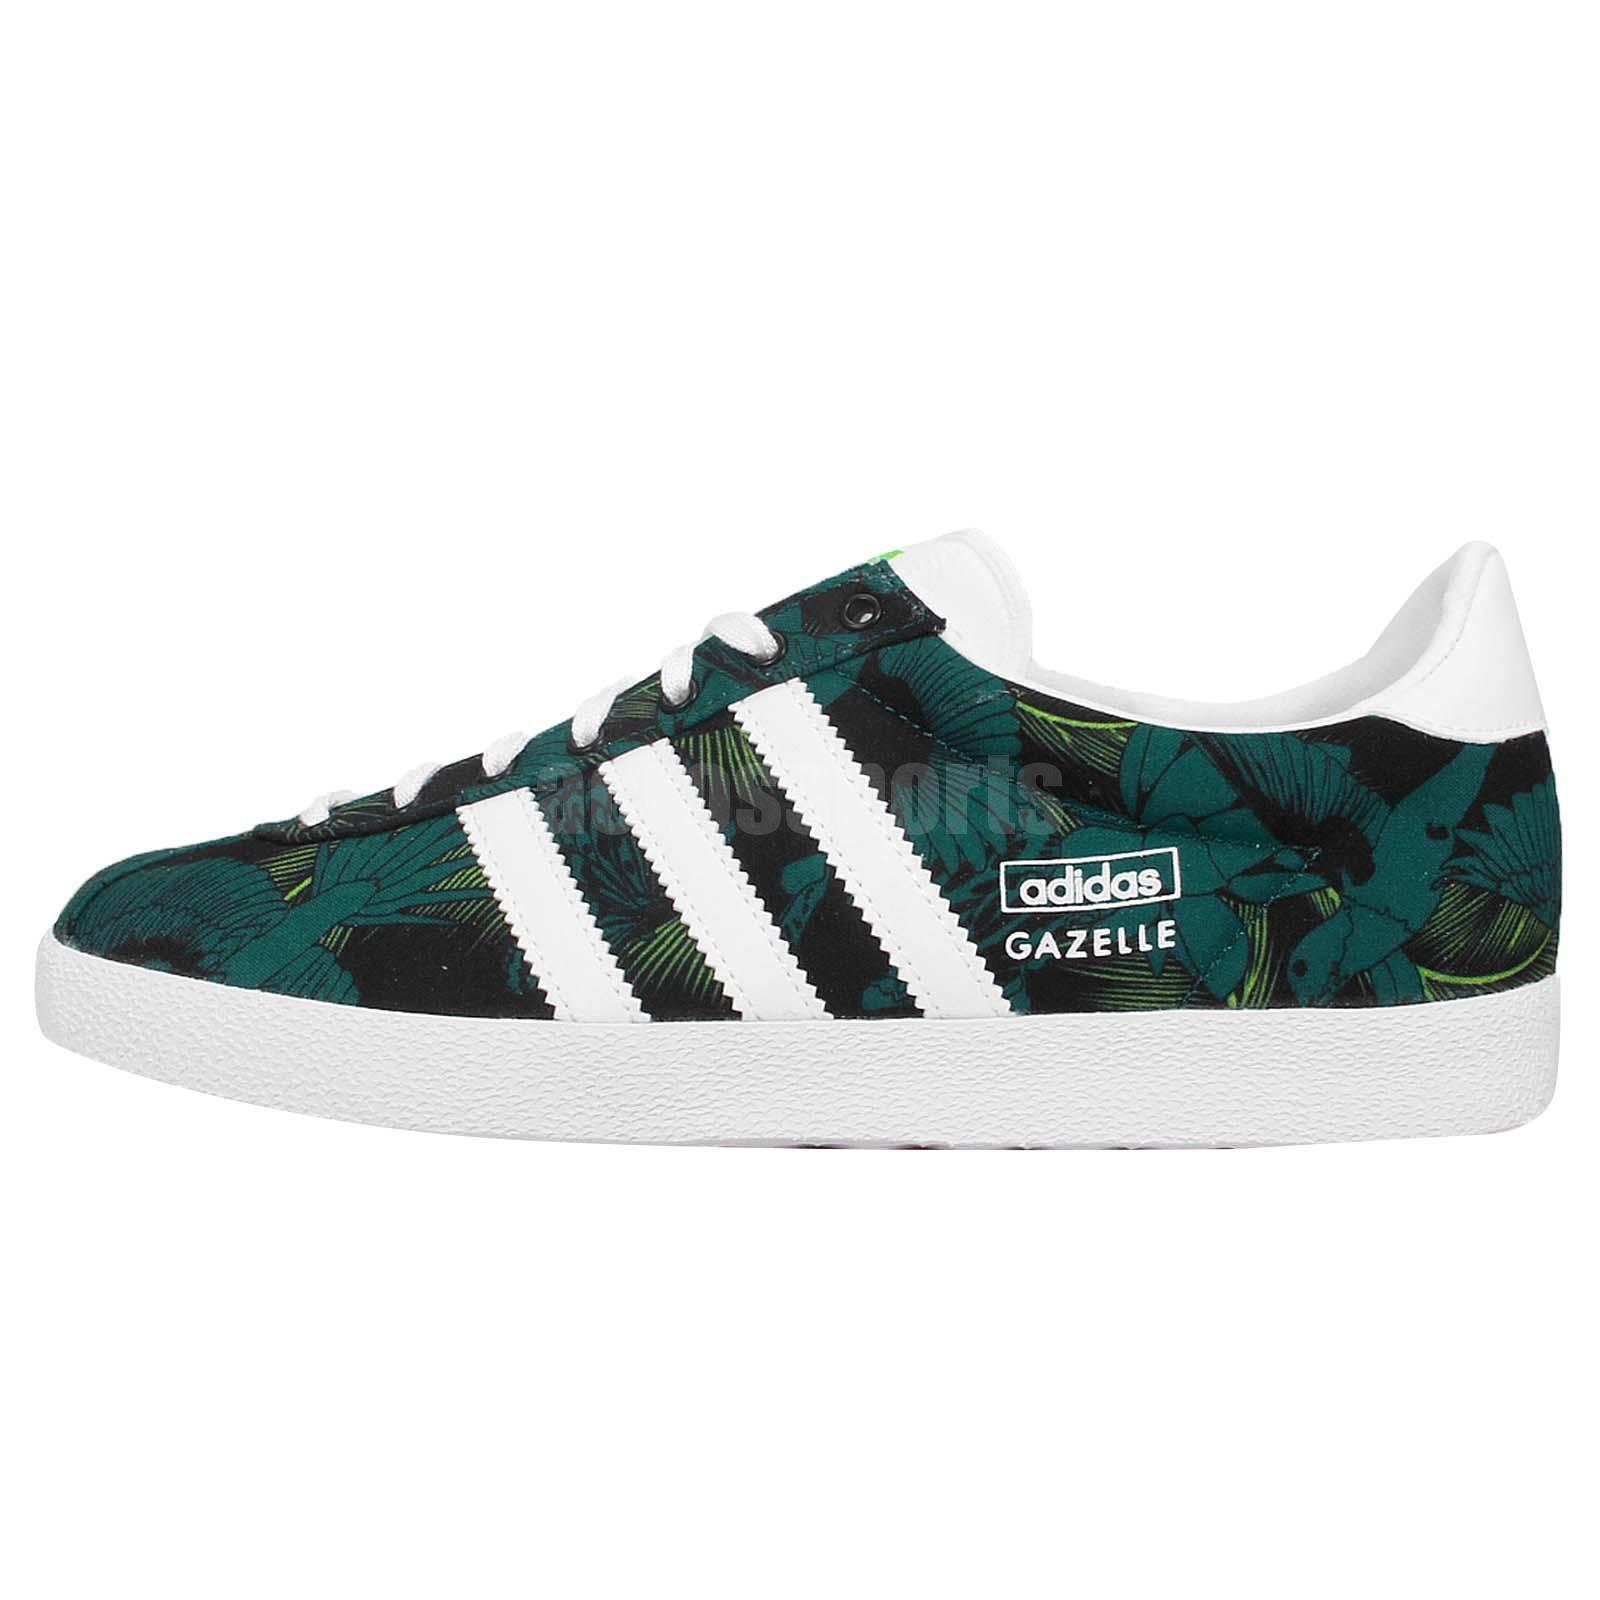 Adidas Originals Superstar - Chaussures Adidas Running Pas Cher Pour Homme Femme  Lotus Print Blanche Gazelle Adidas A Fleur 756705834bbf